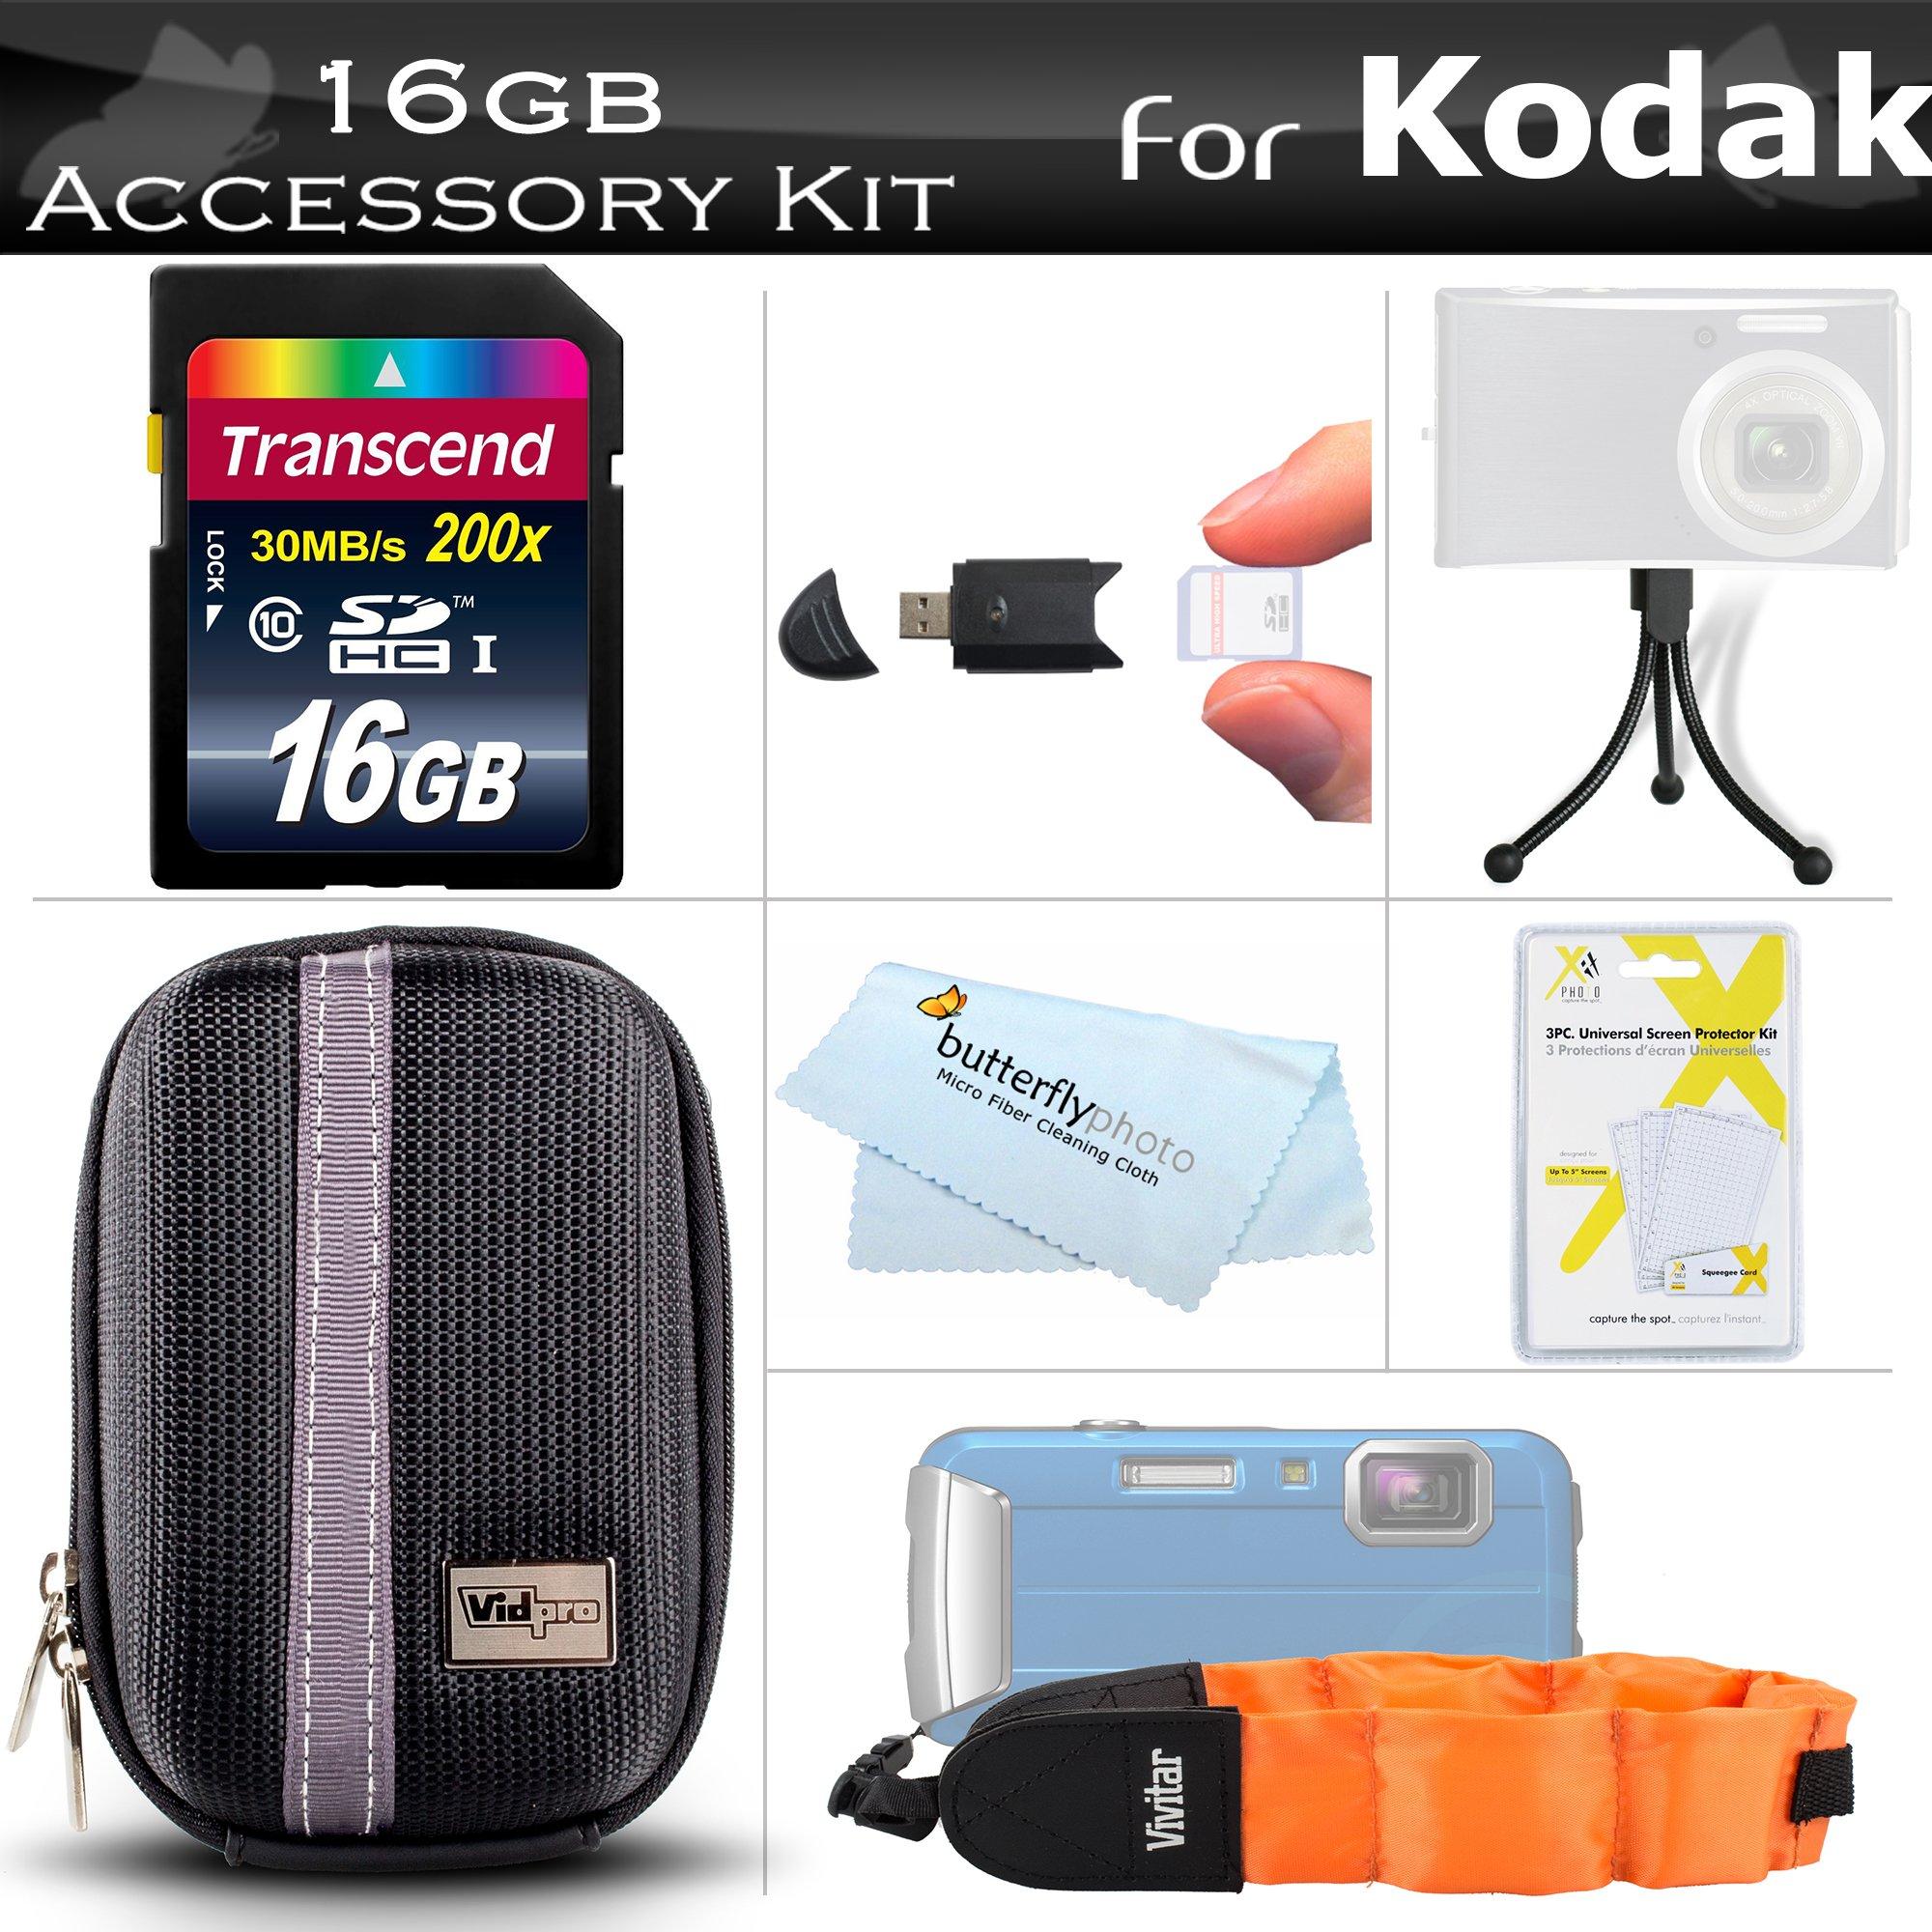 16GB Accessories Bundle Kit For Kodak PlaySport (Zx5) HD Waterproof Pocket Video Camera (2nd Generation) NEWEST MODEL Includes 16GB High Speed SD Memory Card + Hard Case + USB Card Reader + Float Strap + Screen Protectors + Mini Tripod + MicroFiber Cloth